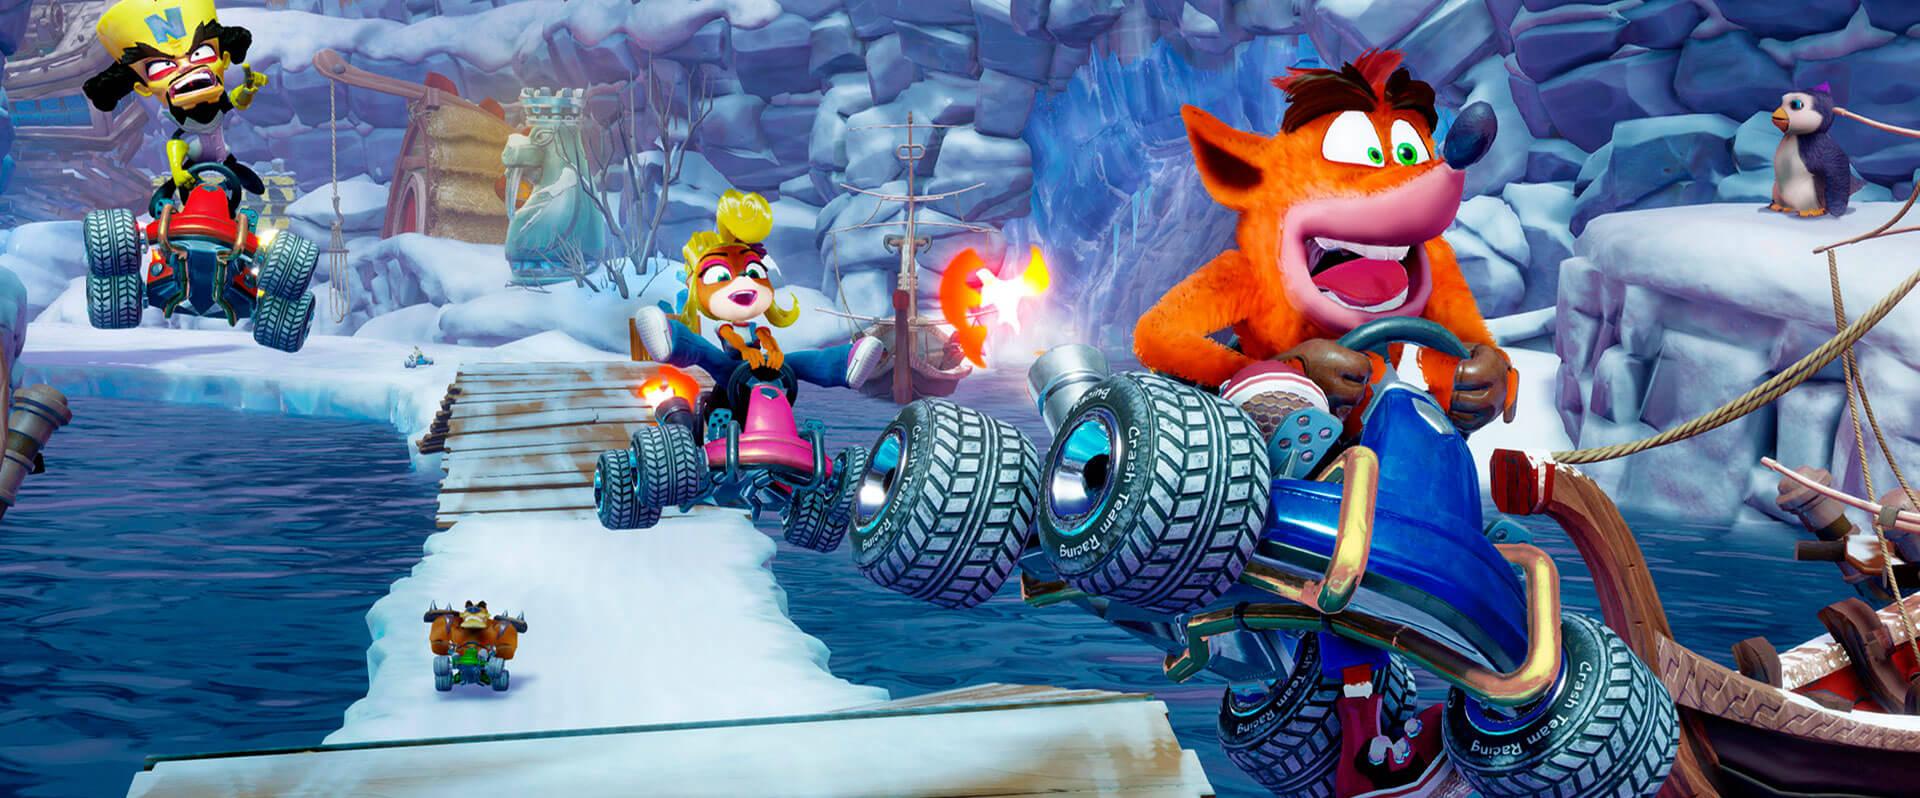 Crash Team Racing Nitro Fueled Análisis Texto 5